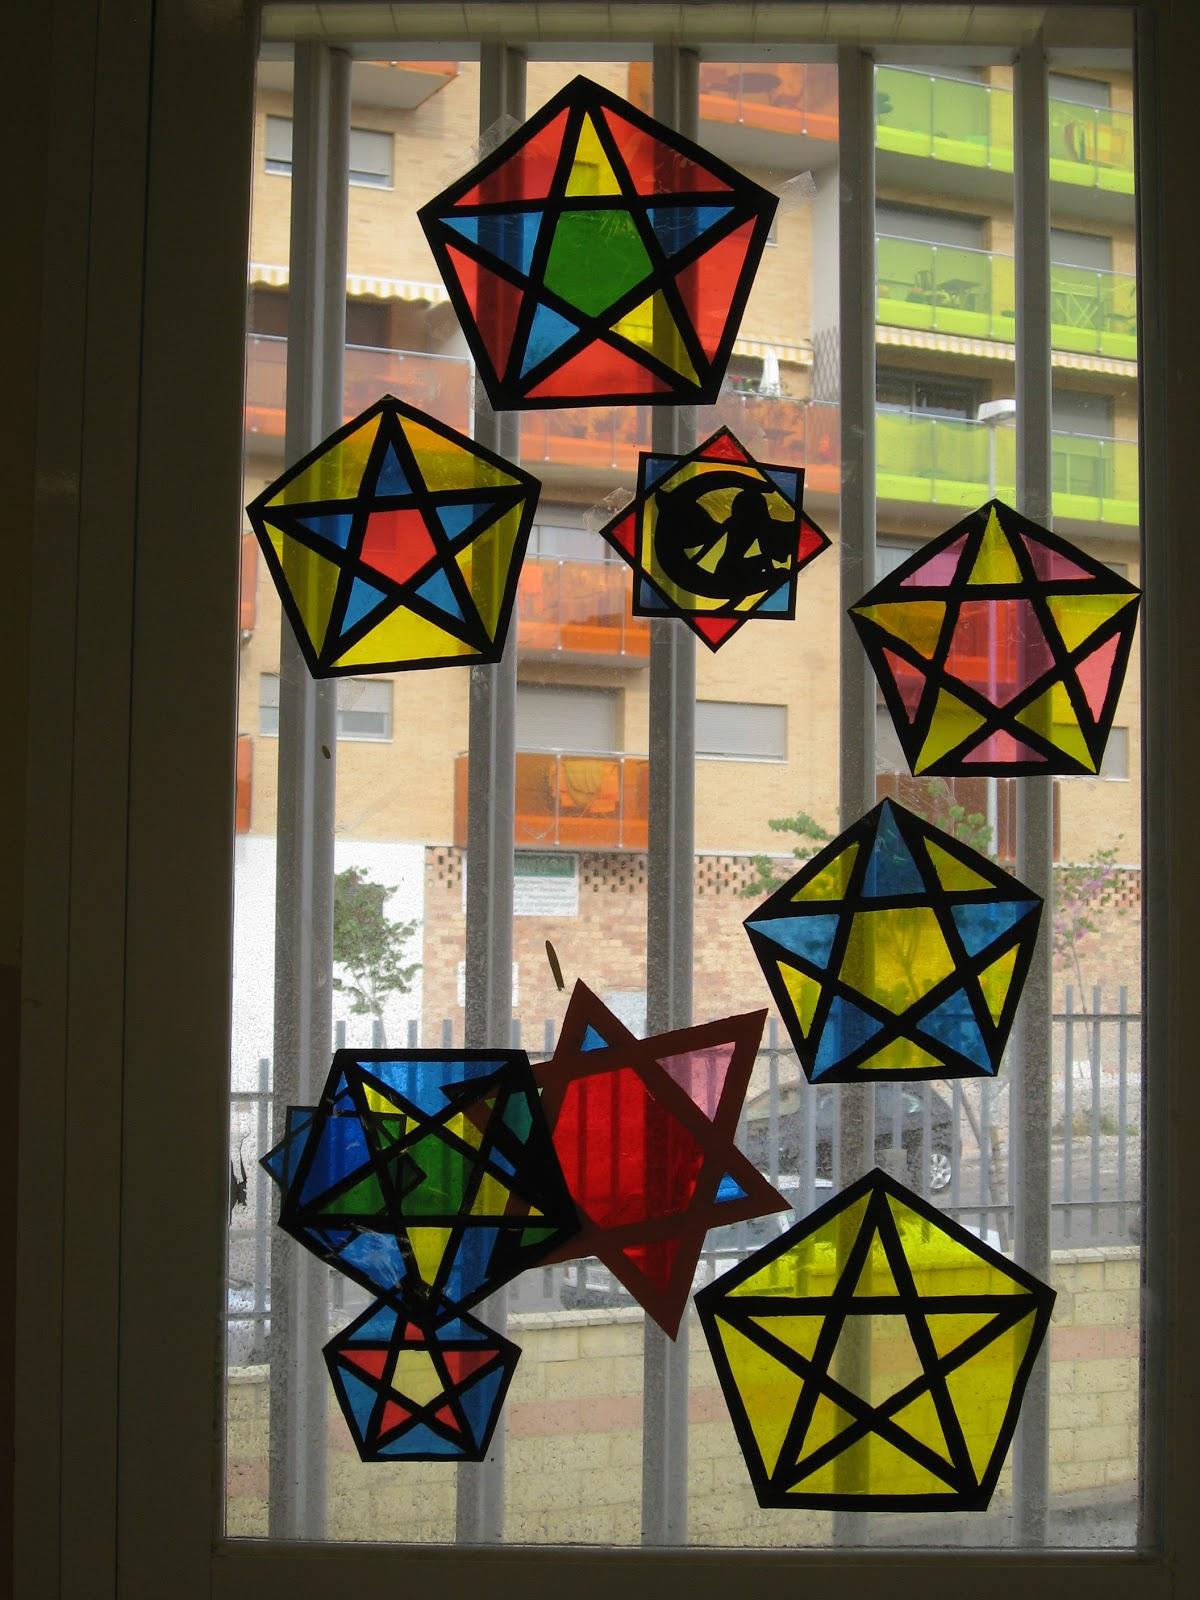 Epv 1 eso ies joaqu n lobato u d 7 figuras geom tricas - Como hacer una vidriera ...